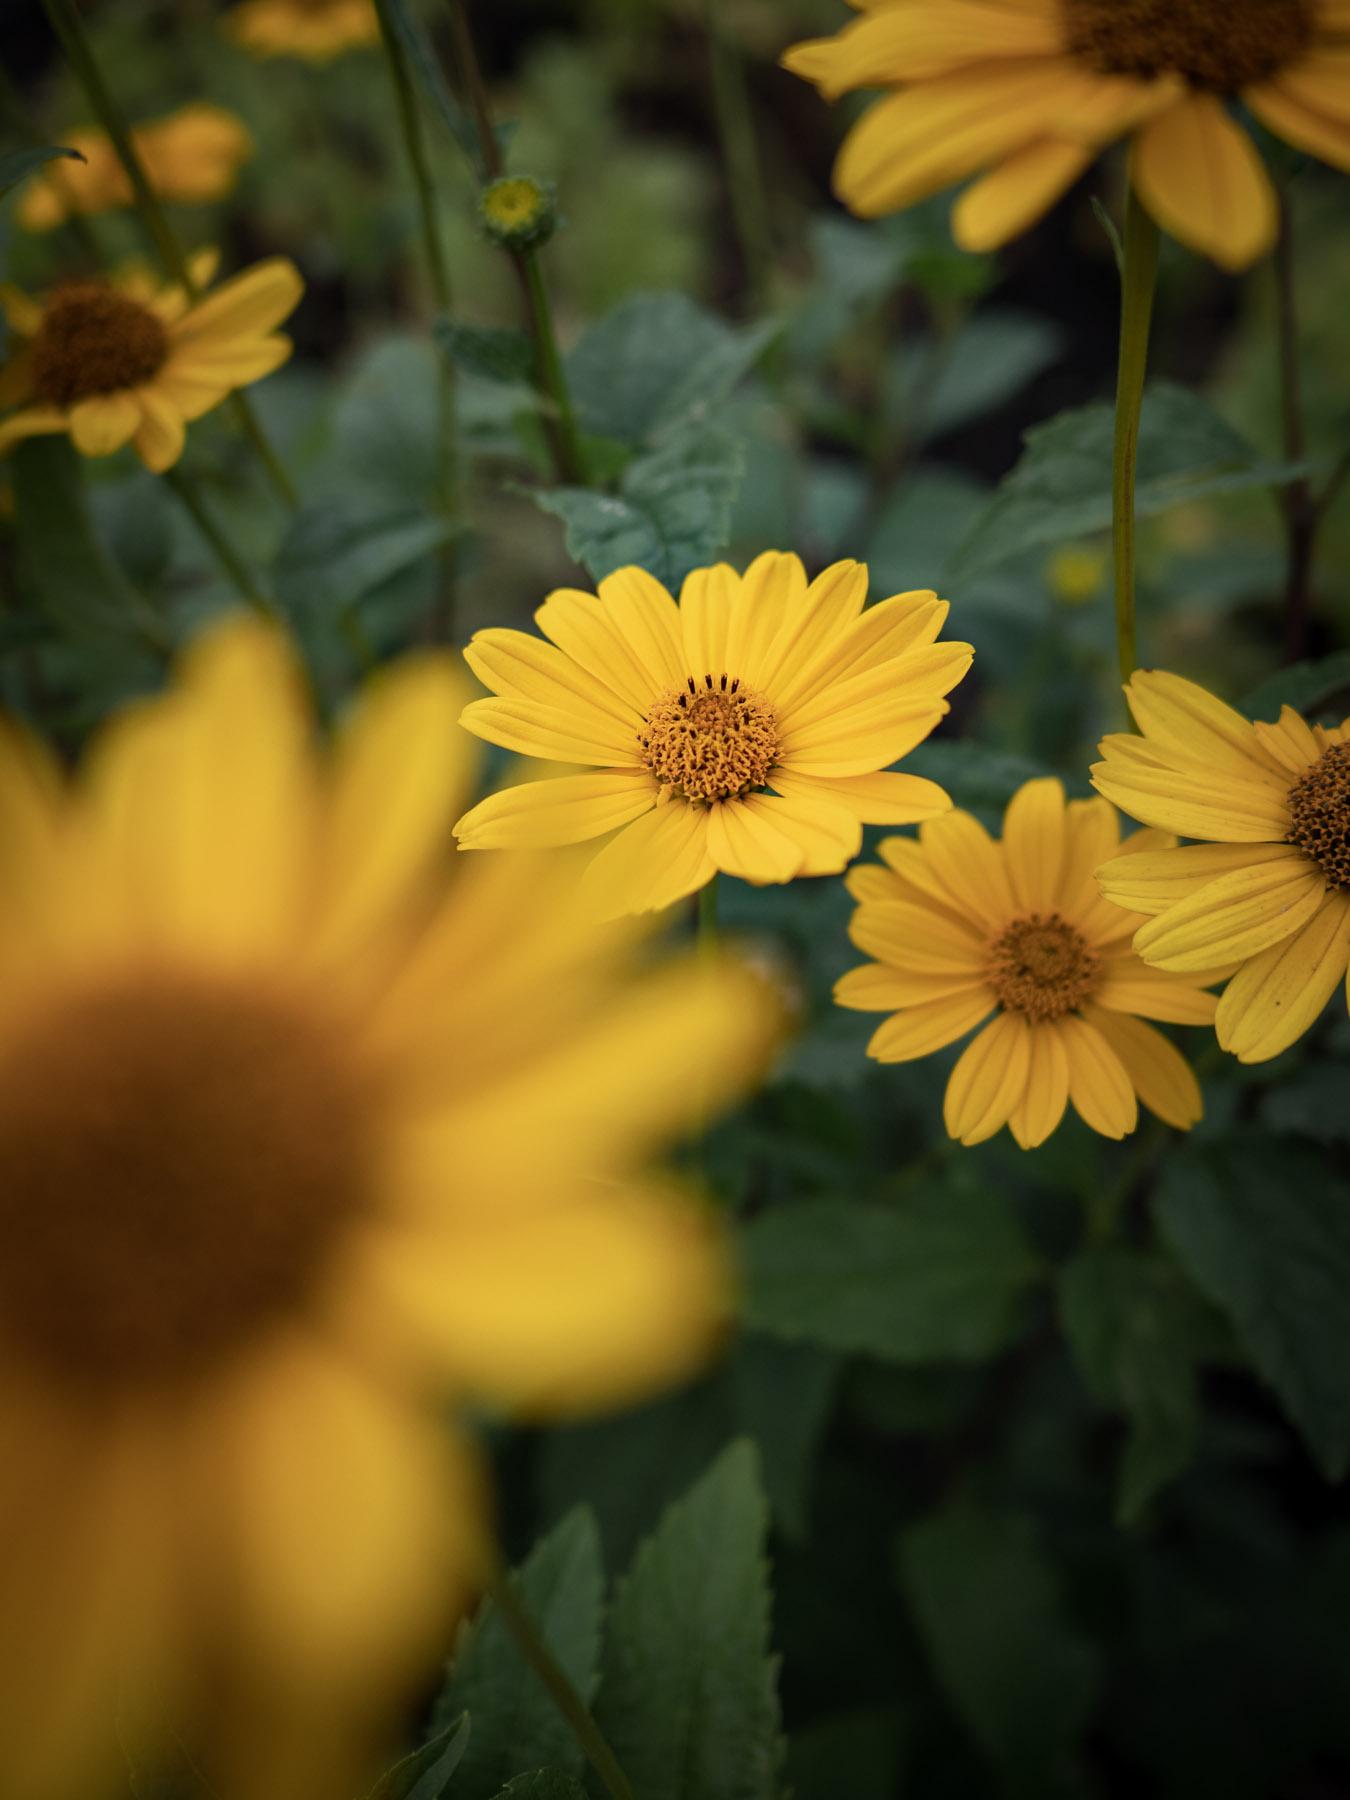 F2.0、縦位置で撮影した黄色い花 前ボケ、後ボケが美しい